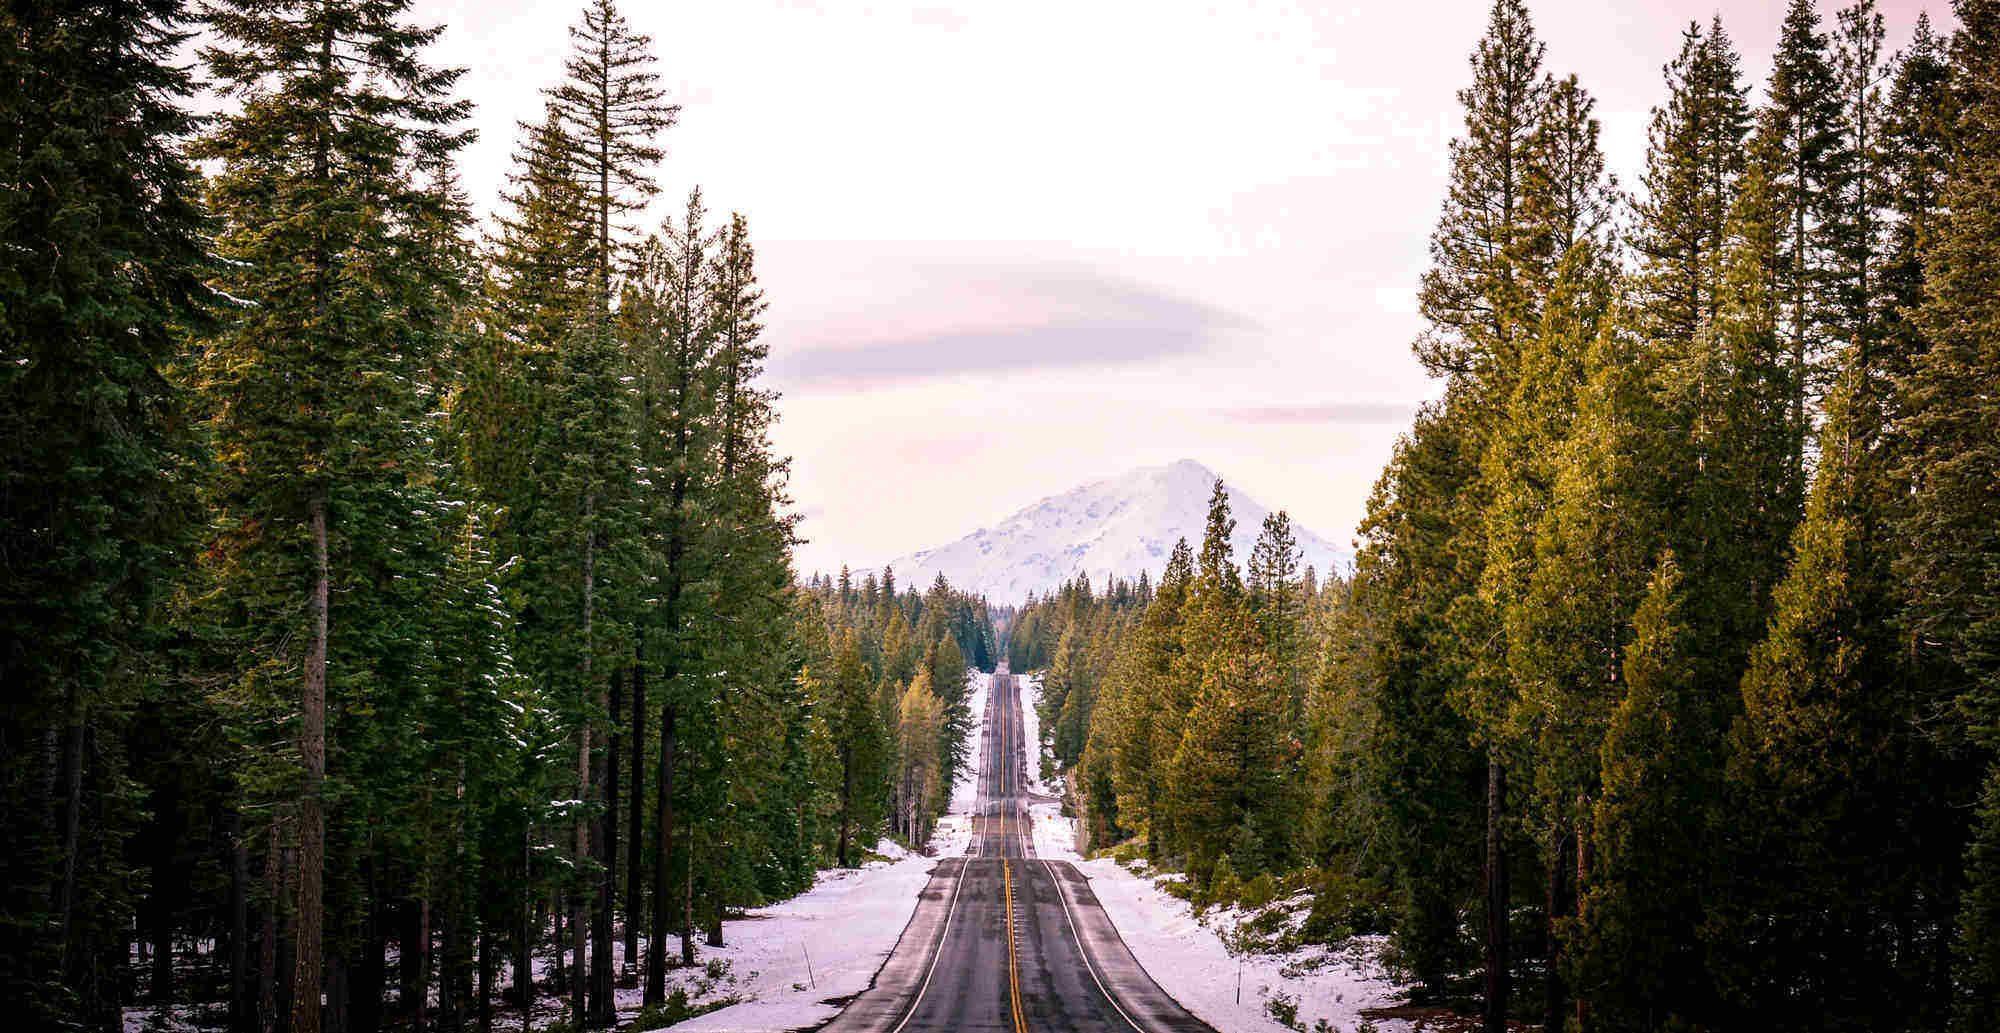 MS & rijbewijs: CBR rijtest